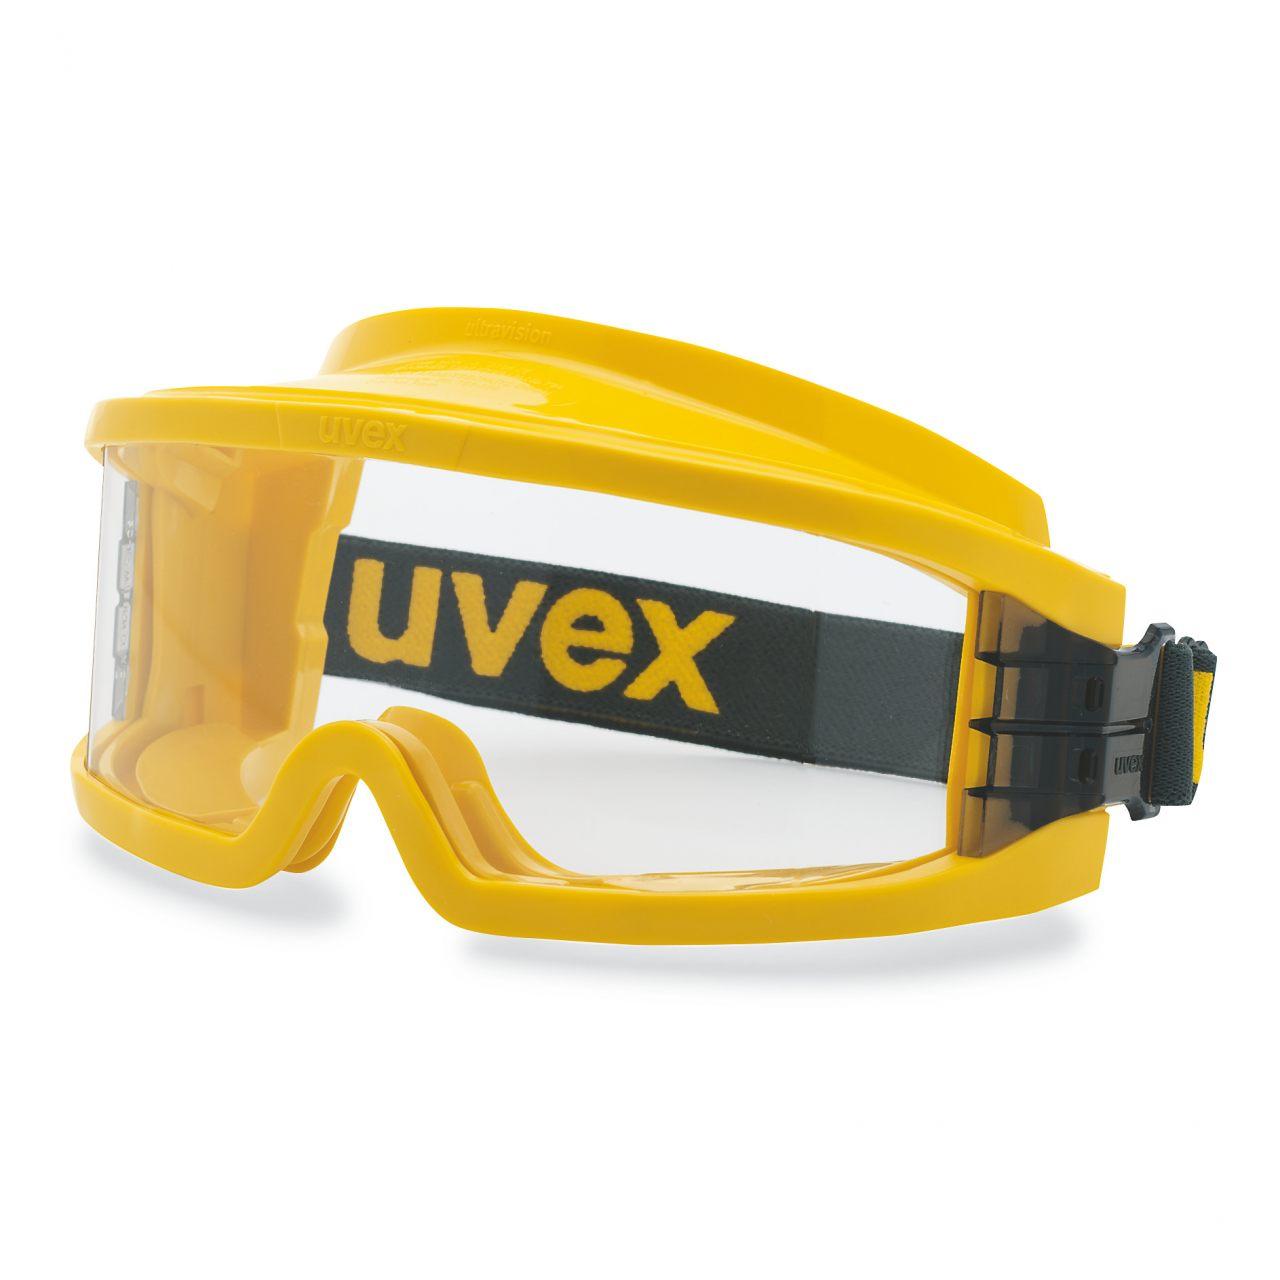 UVEX Ultravision